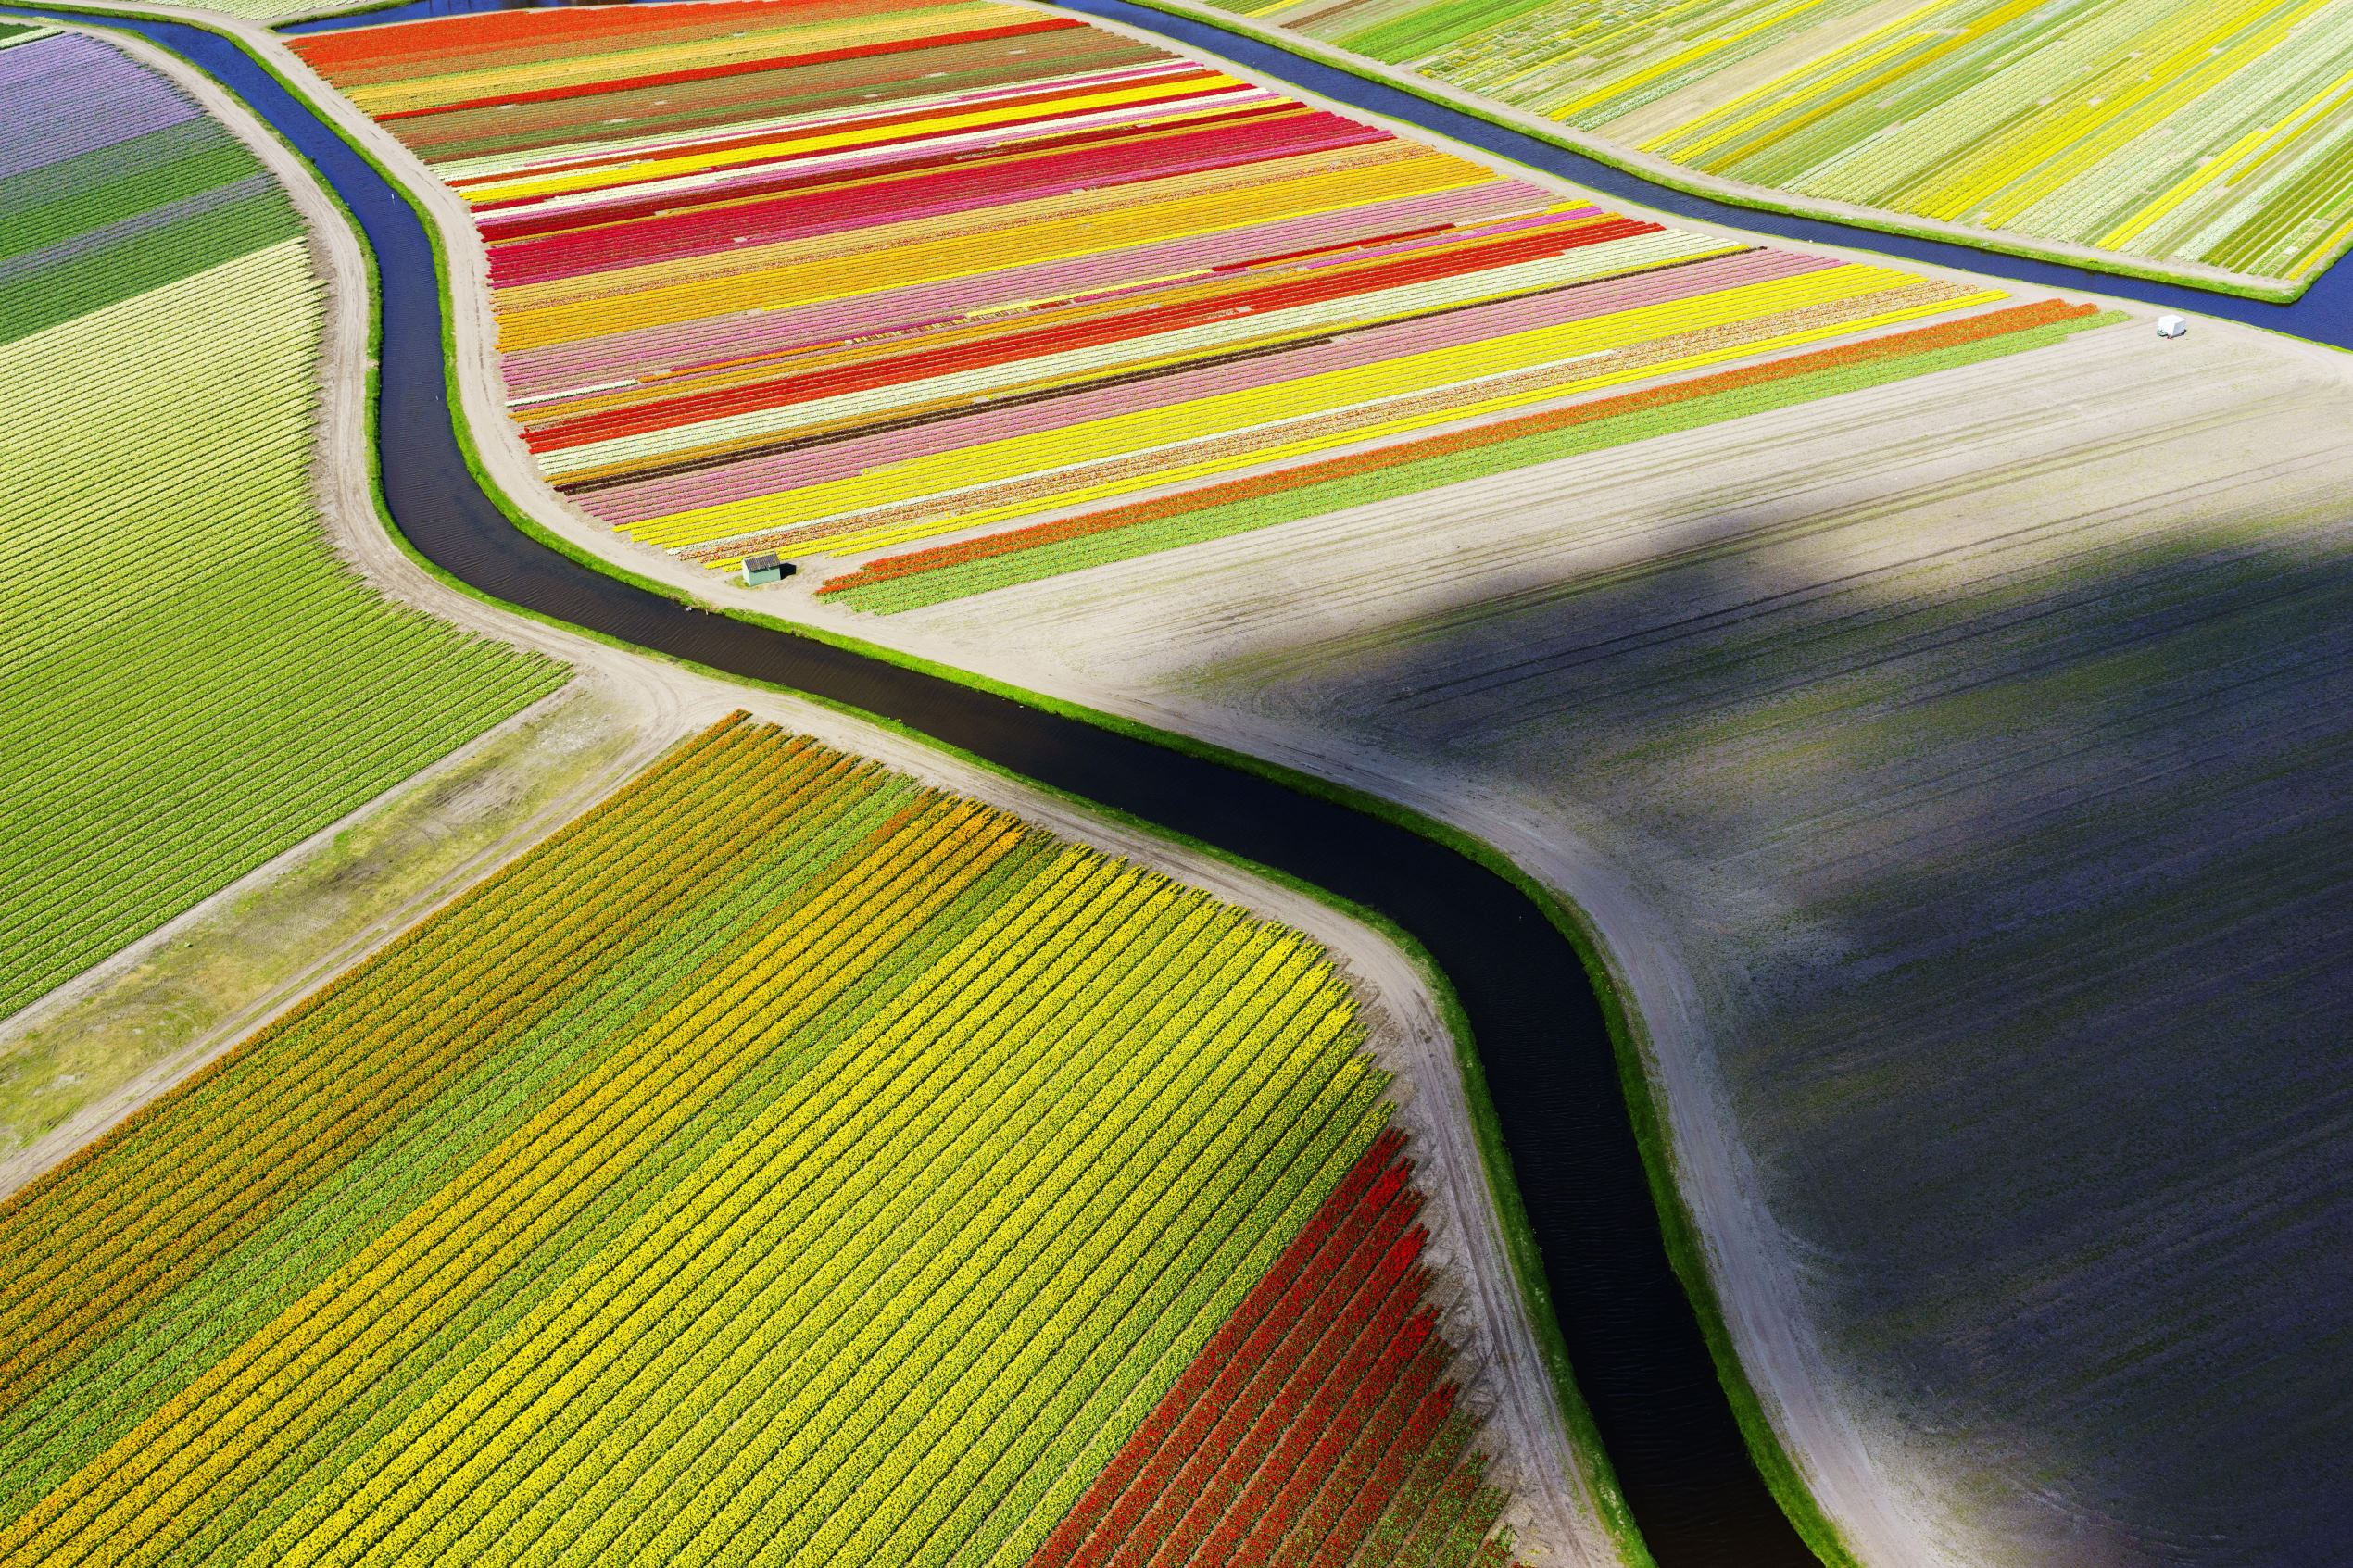 Slide 33 of 41: Aerial shots of tulip fields, Sassenheim, Netherlands - Apr 2015 Aerial shot of the tulip fields near Sassenheim, taken using a drone